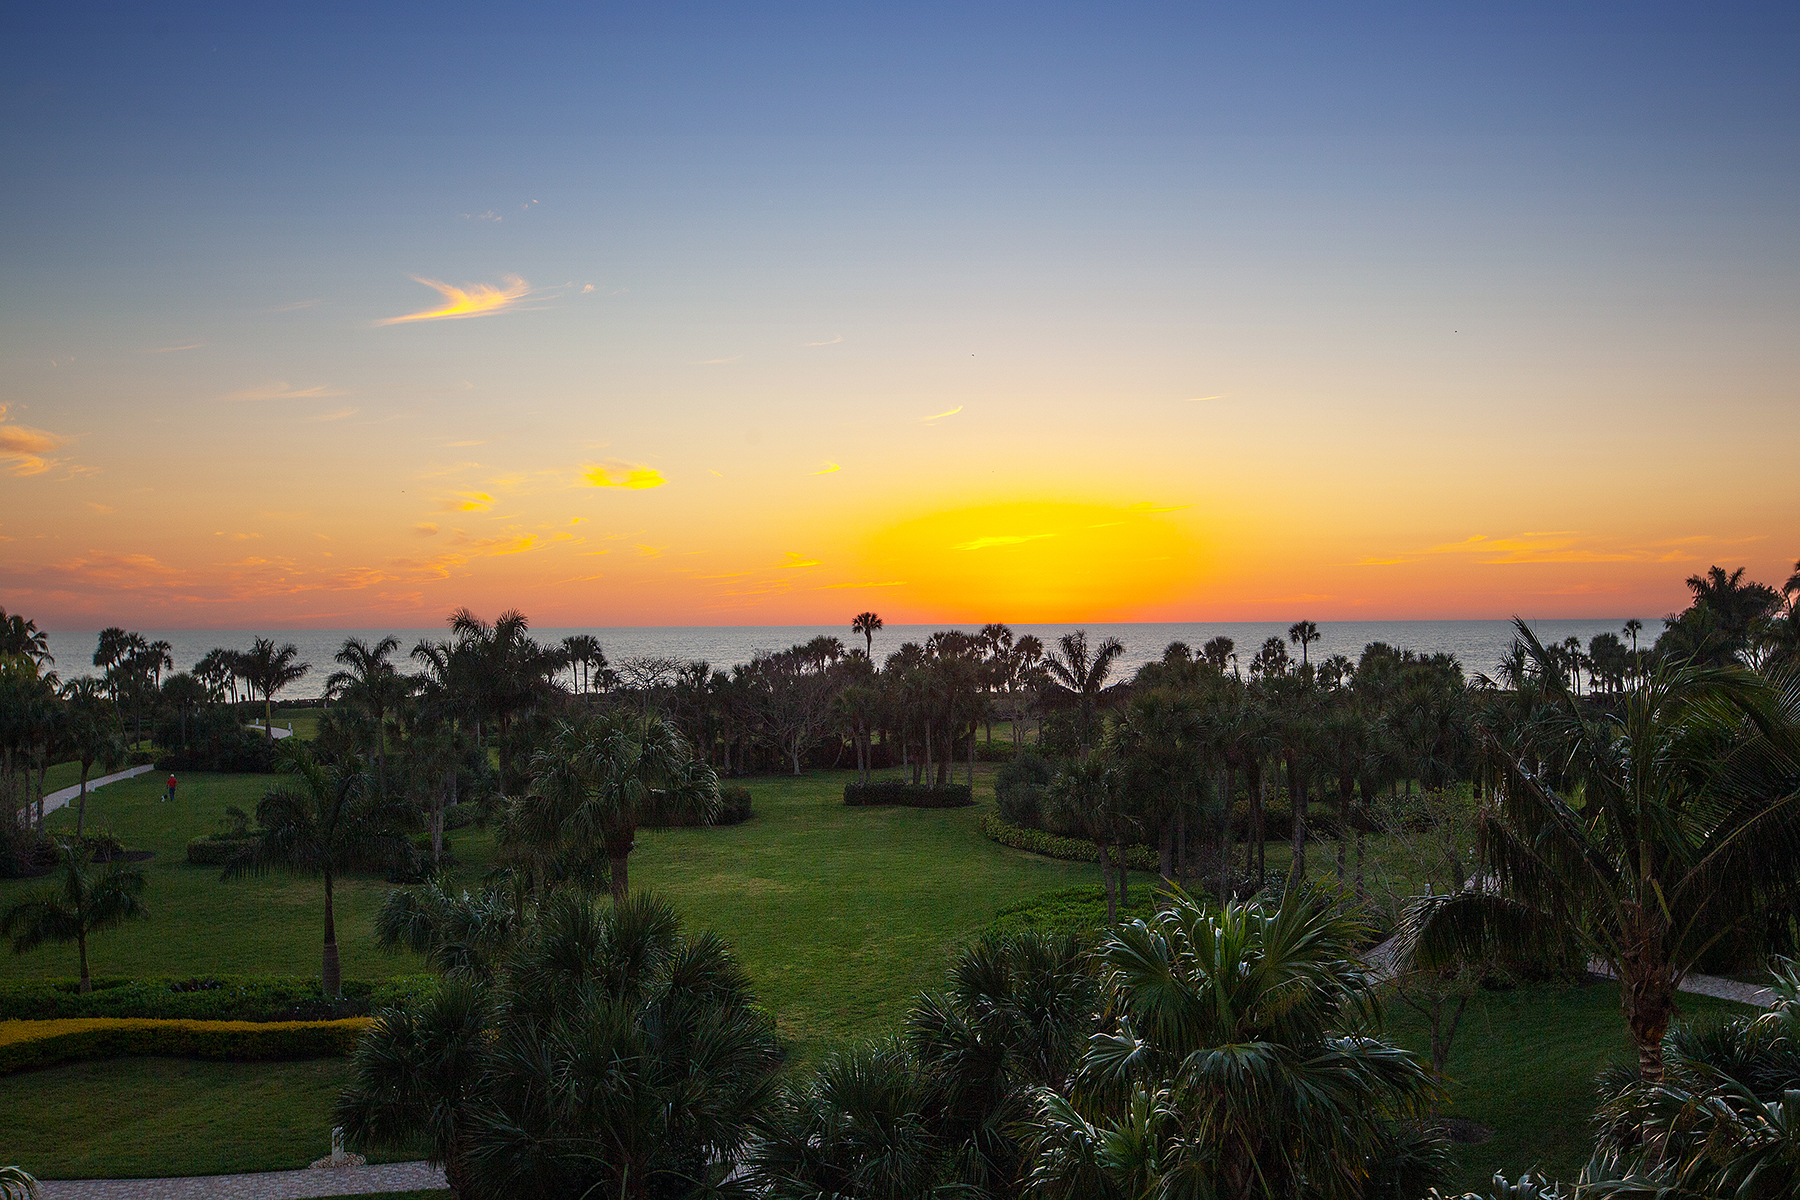 Condominium for Sale at PARK SHORE - LE JARDIN 4201 Gulf Shore Blvd N 403 Naples, Florida, 34103 United States